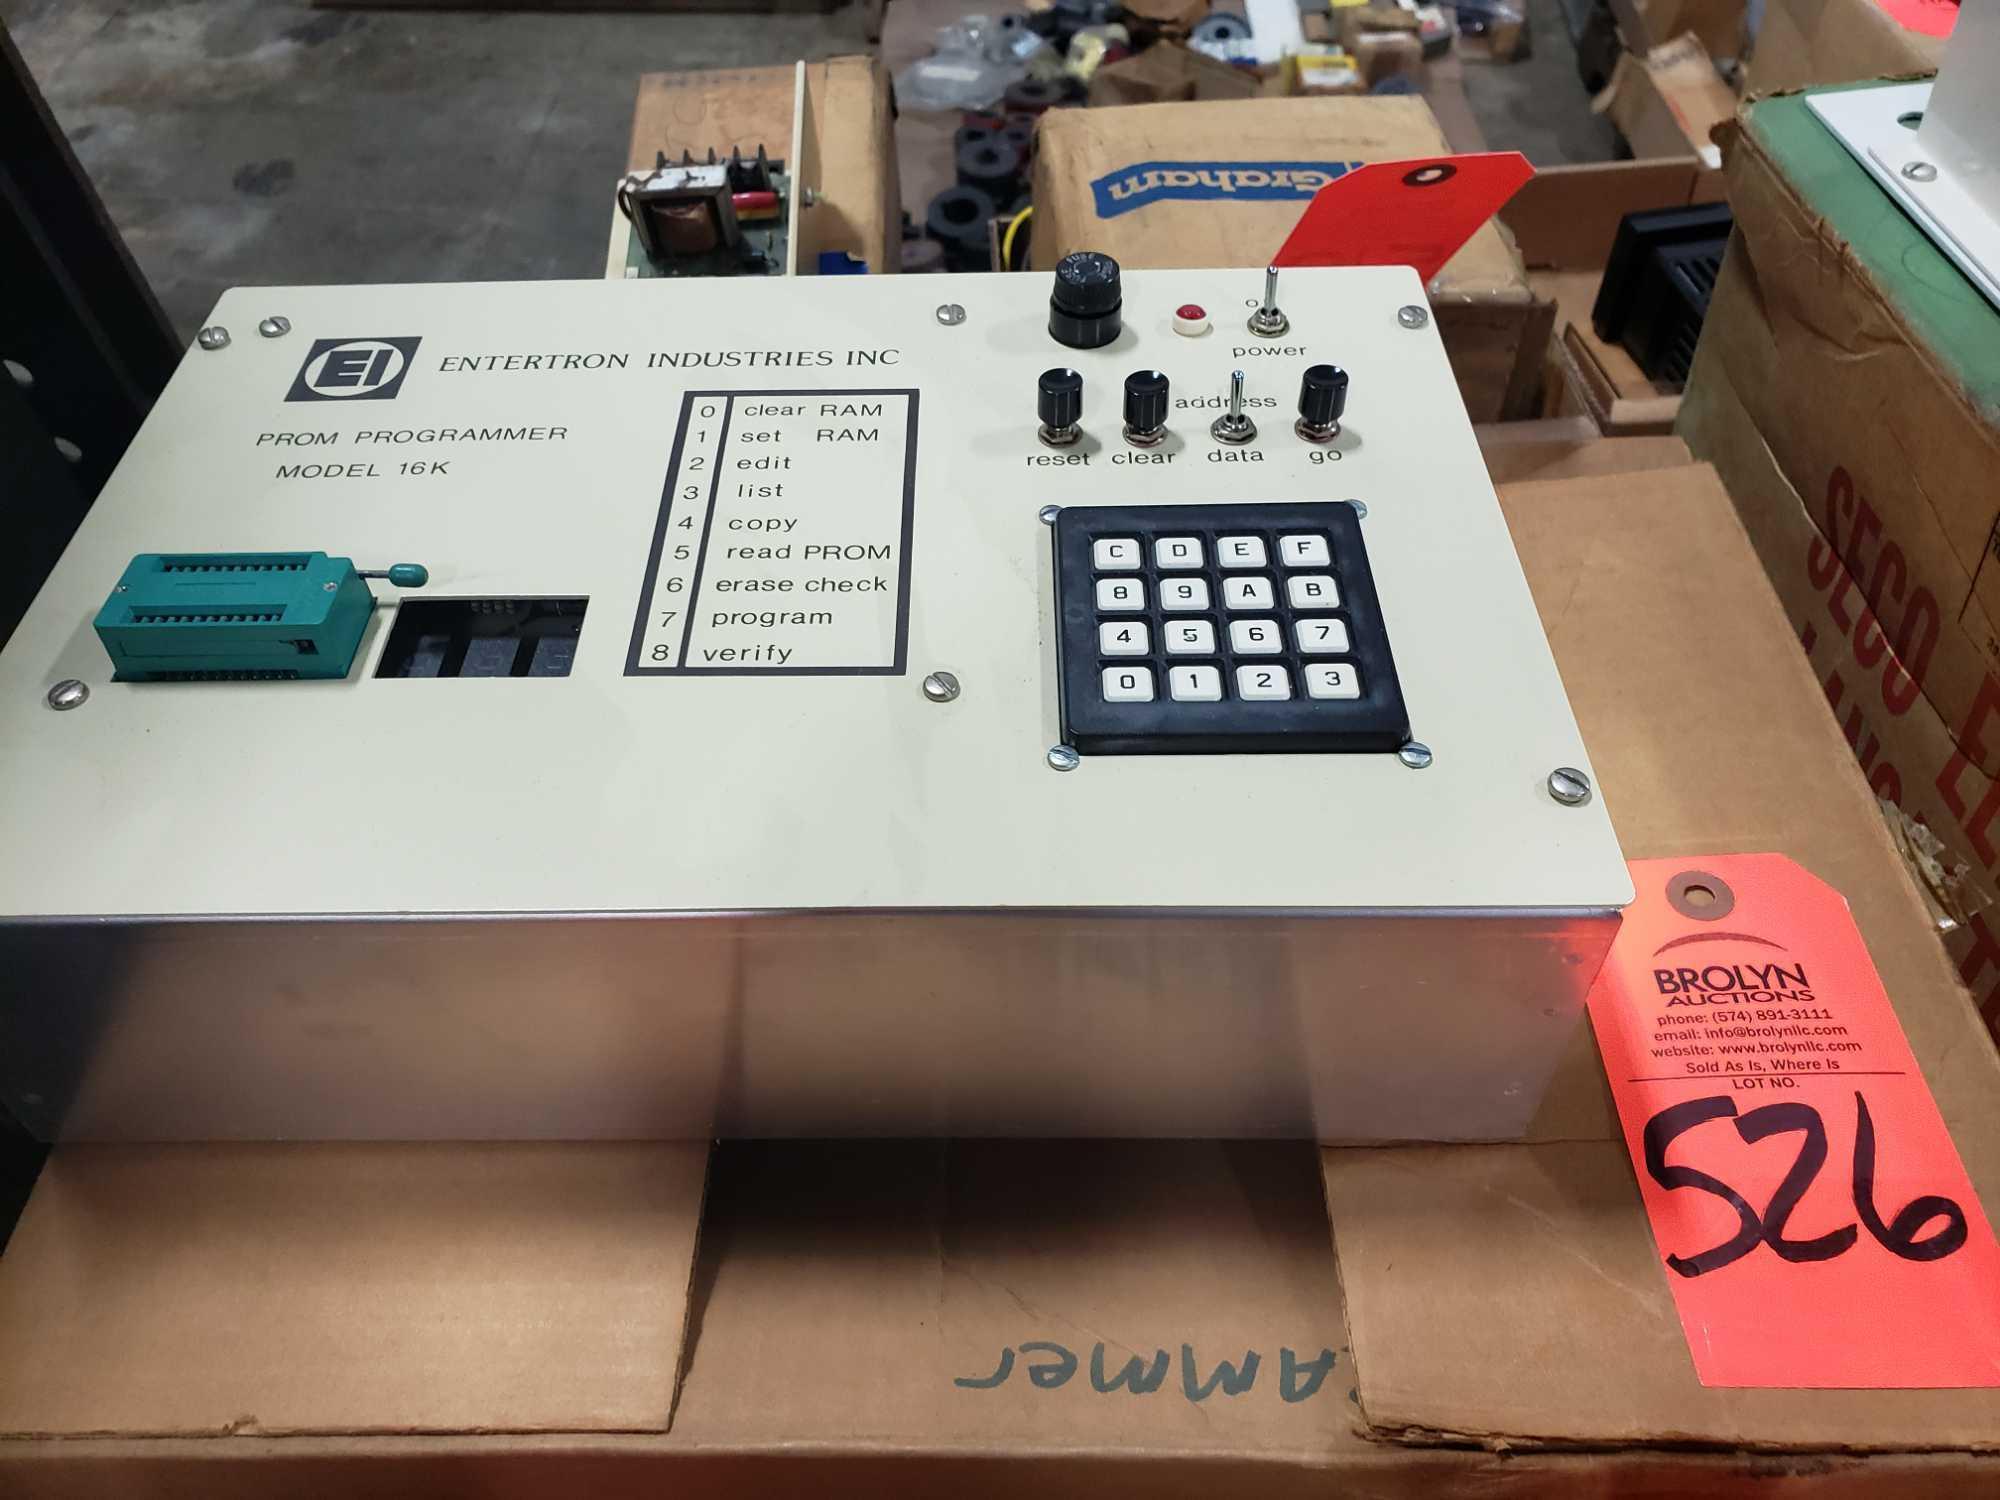 Entertron Industries Prom Programmer model 16K. New in box.